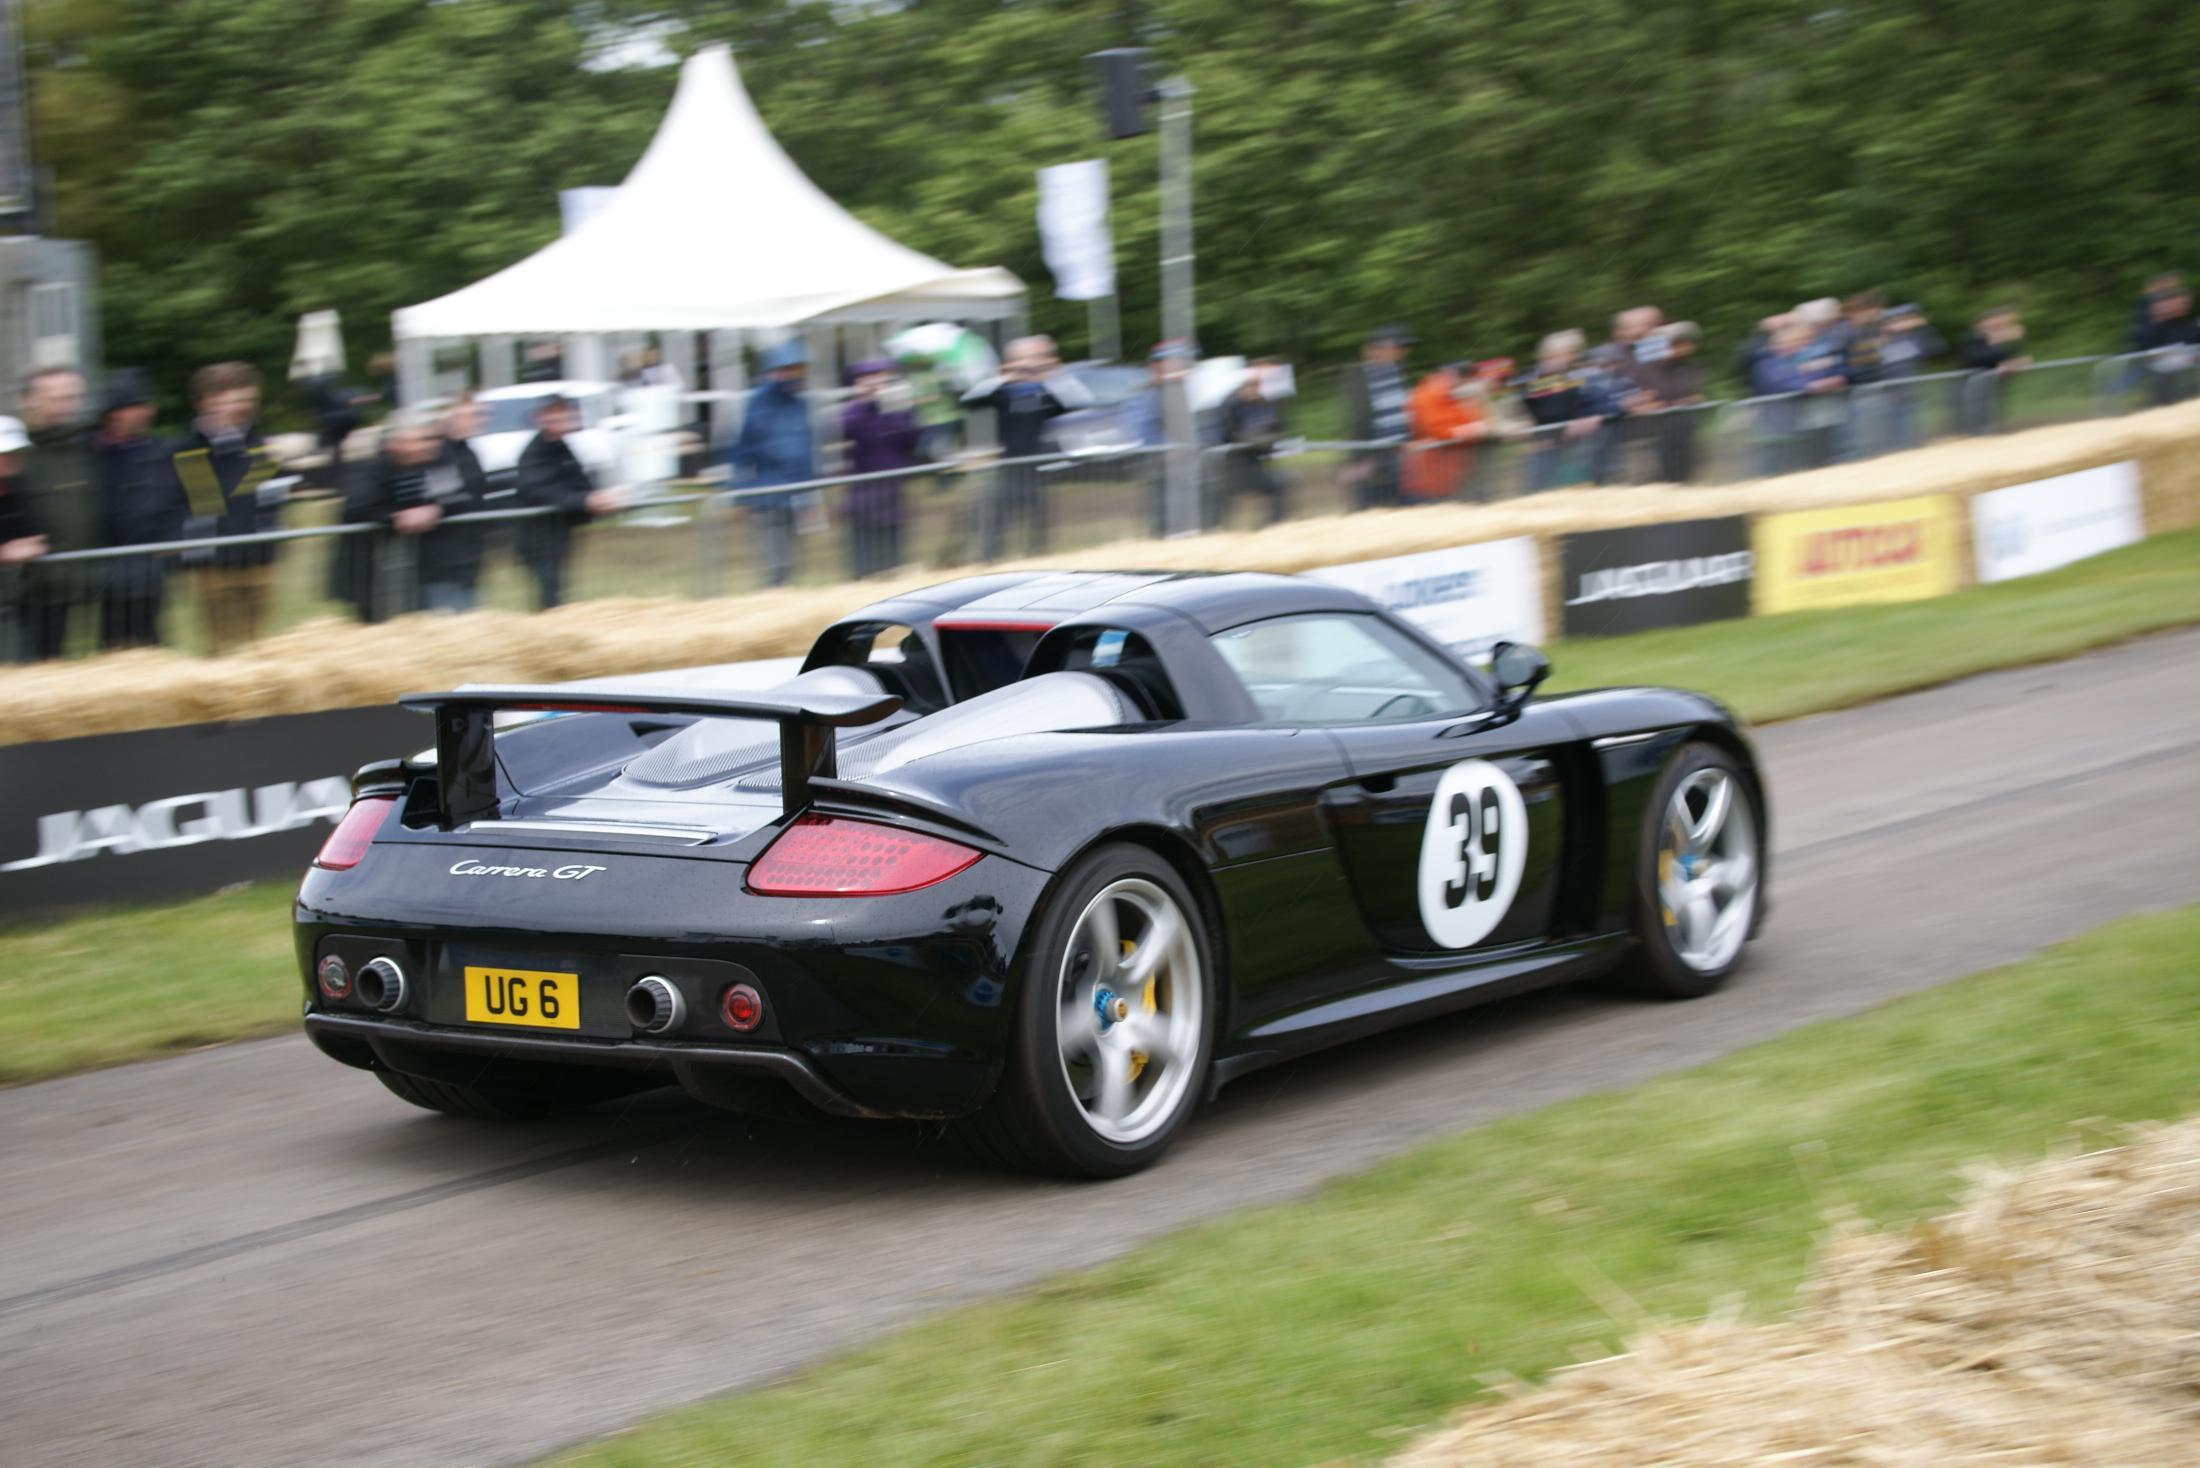 Porsche Carrera GT Cholmondeley 2012